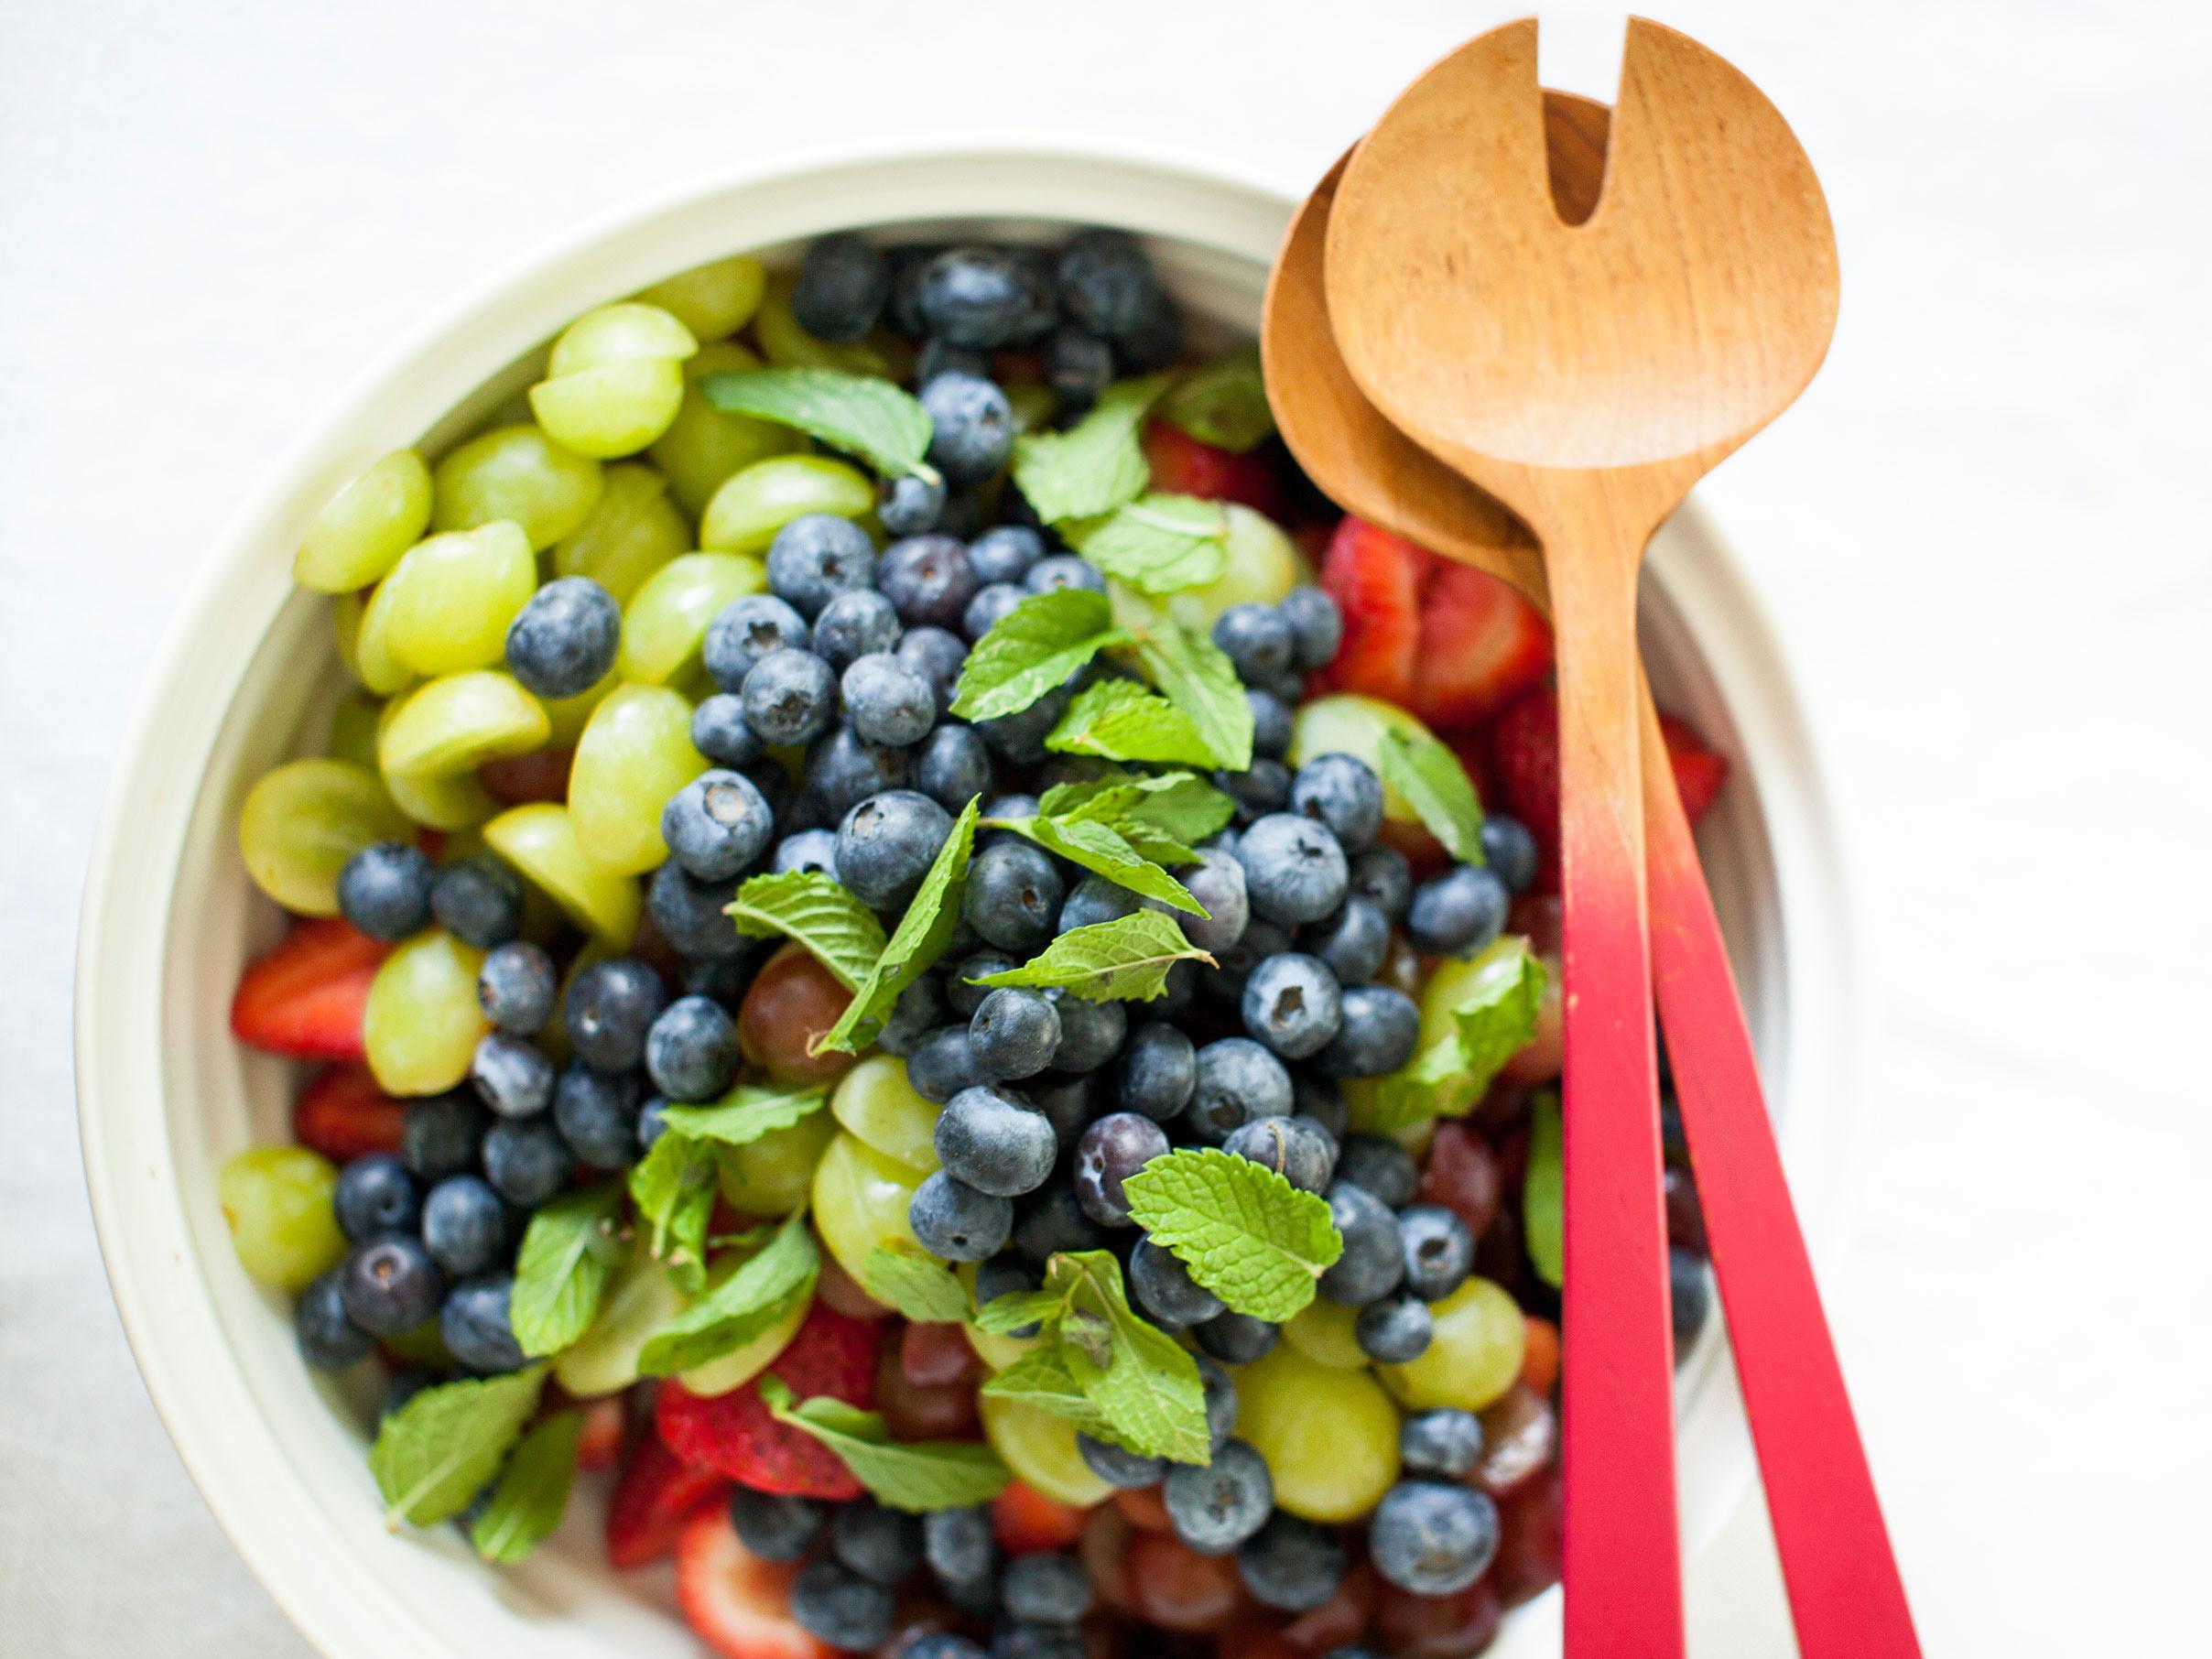 Fruit Salads For Easter Dinner  22 Favorite Brunch Recipes Perfect for Easter